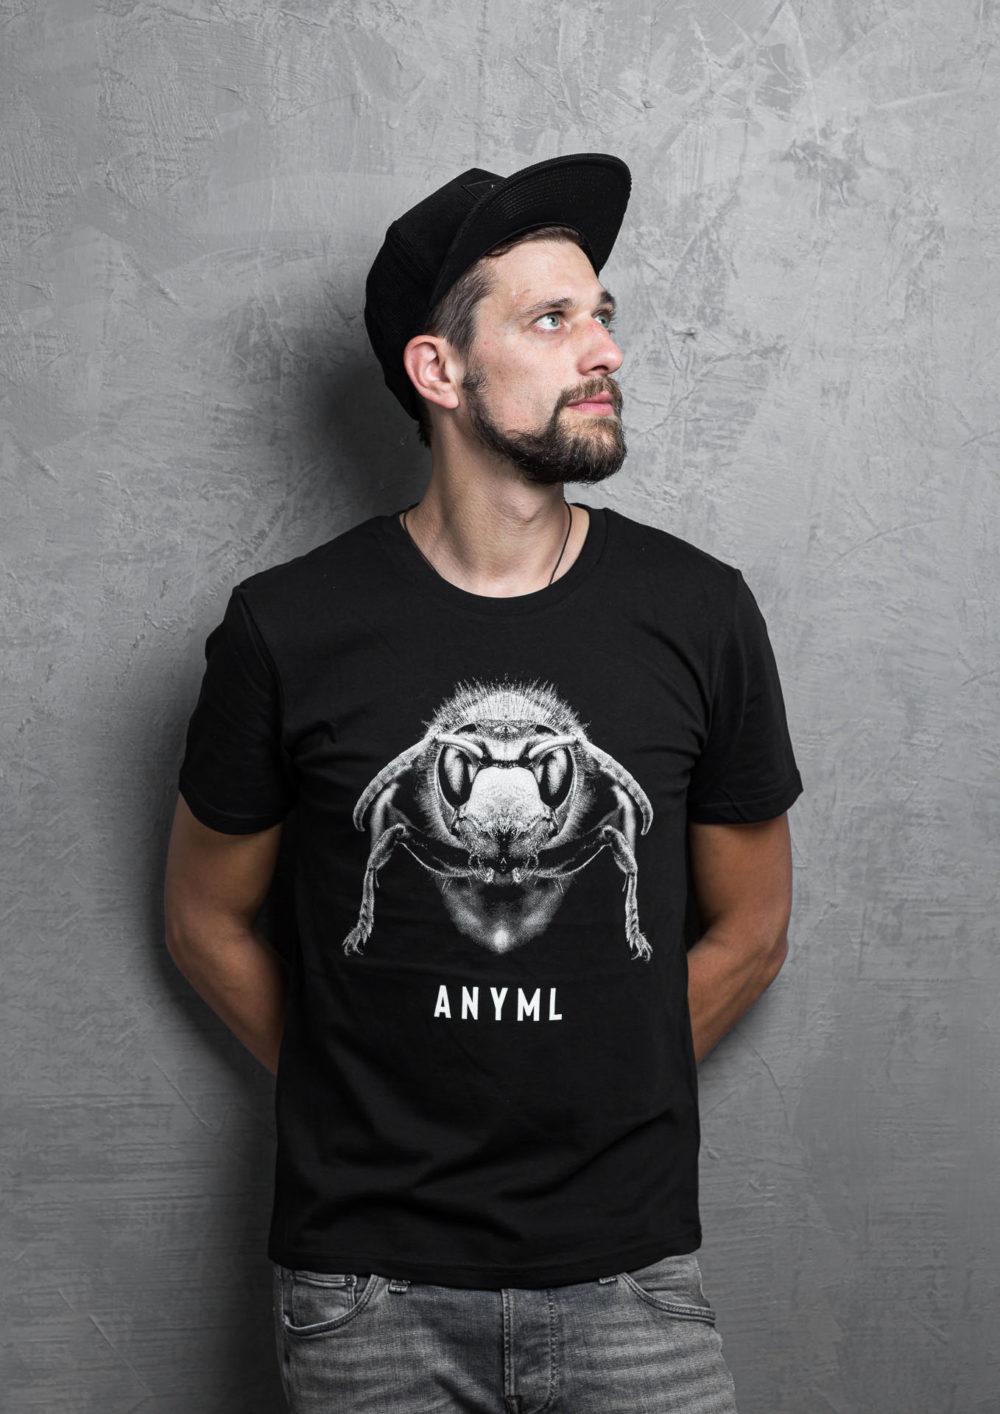 ANYML Shirt - Vespa crabro | Hornisse